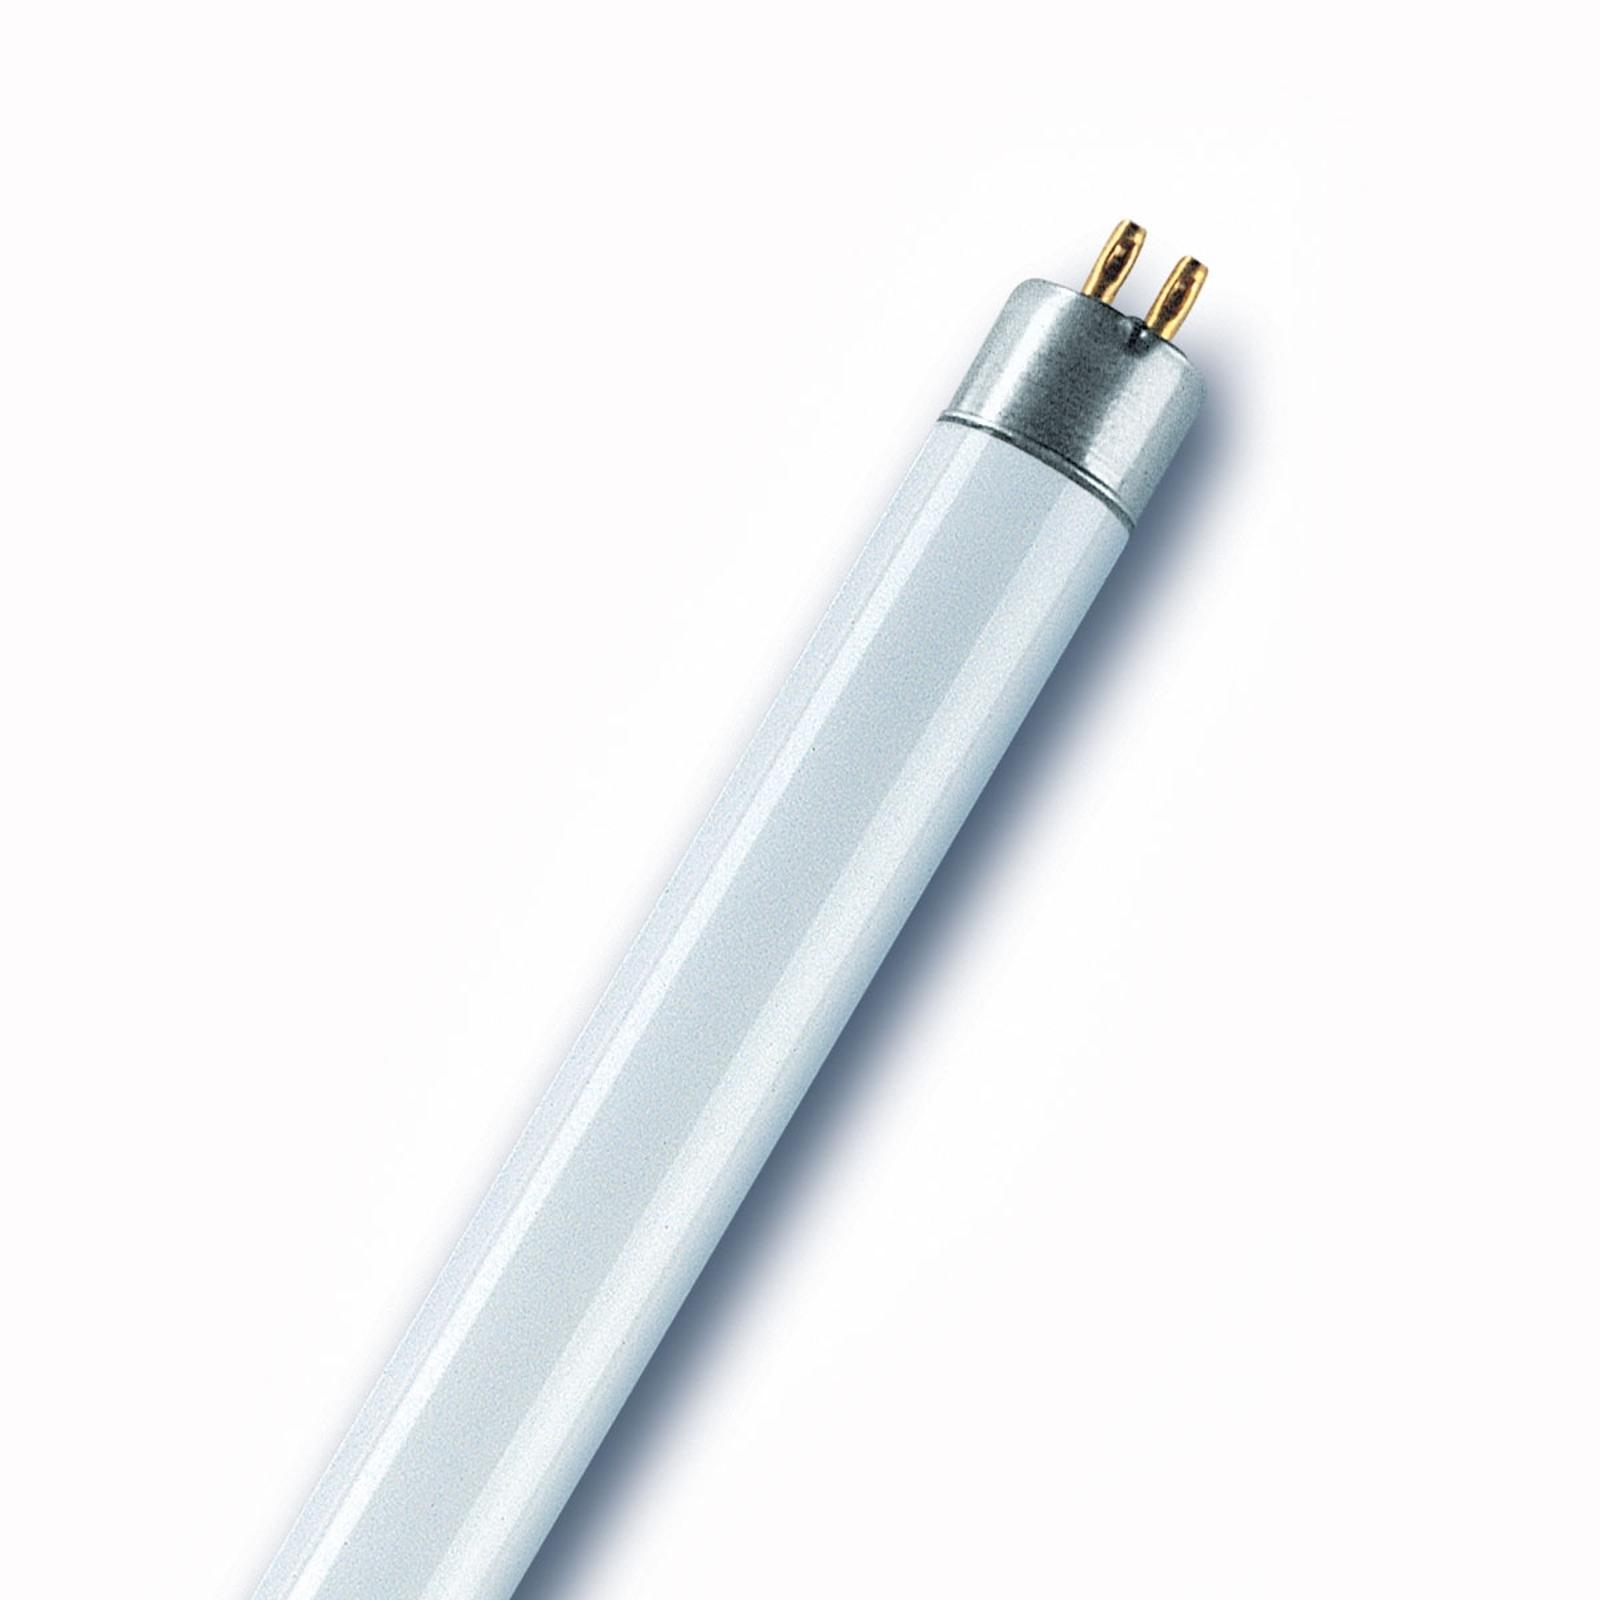 Leuchtstoffröhre G5 T5 39W 865 Lumilux HO